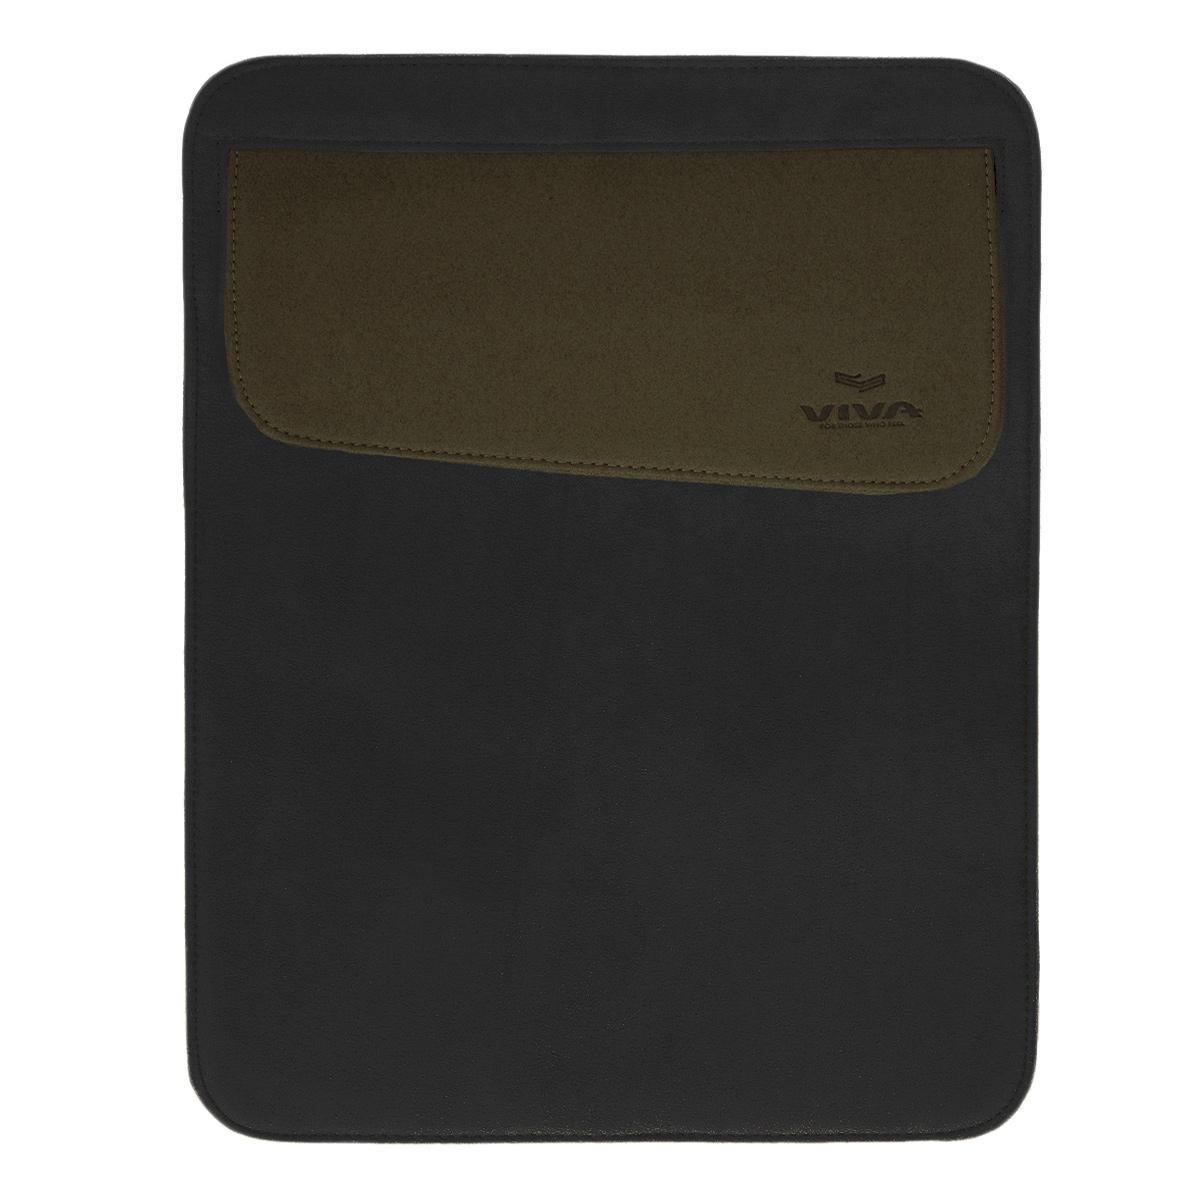 Vivacase текстильный чехол для iPad 2/new/4, Black (VAP-AC00301-bl)